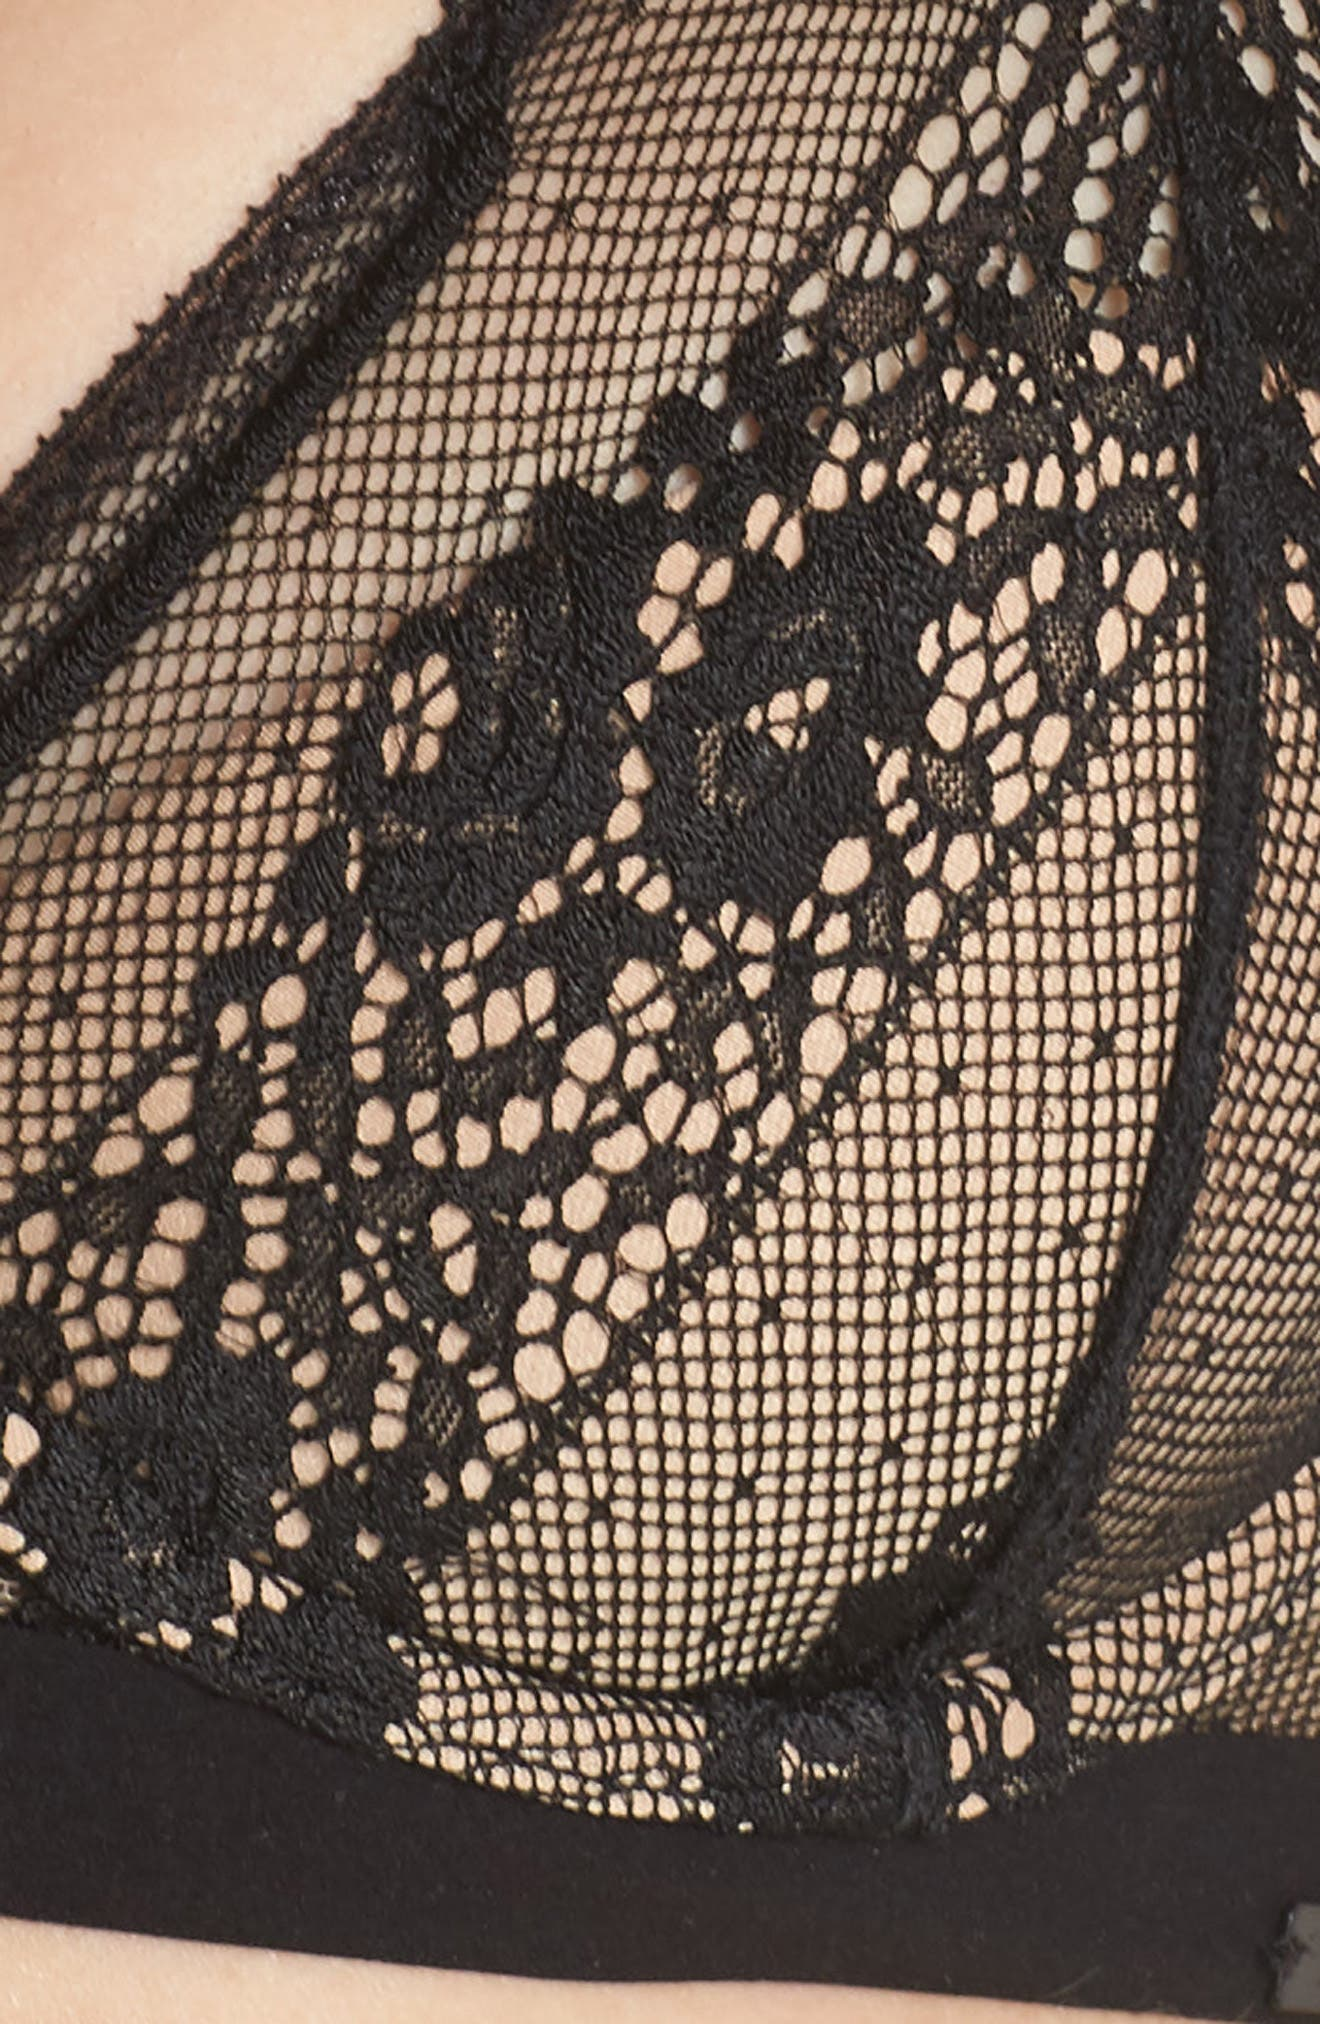 Lace Triangle Bralette,                             Alternate thumbnail 10, color,                             Black